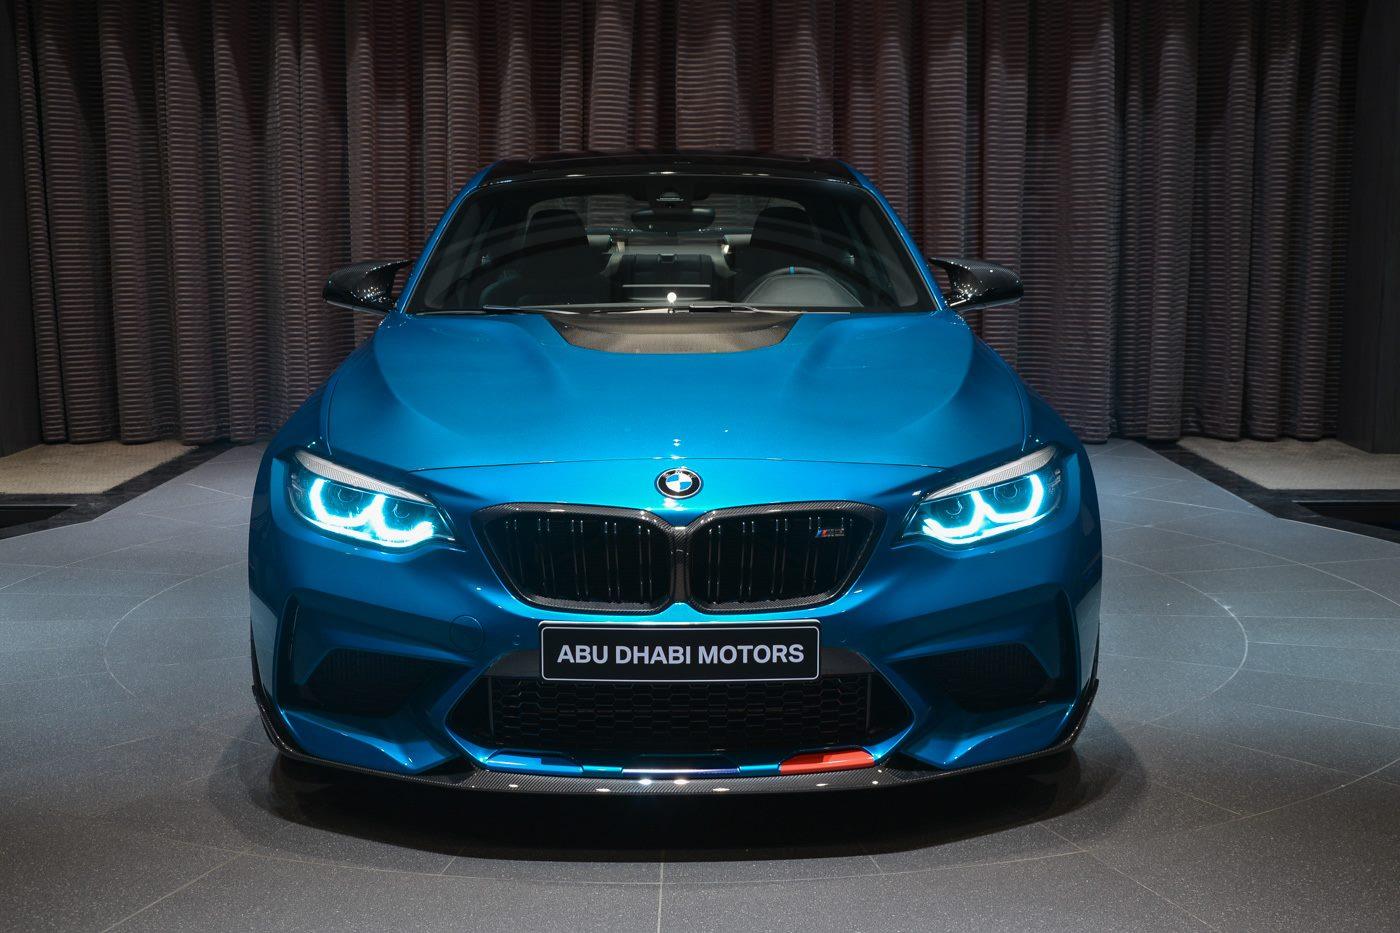 BMW M2 Competition BMW Abu Dhabi Motors (1)